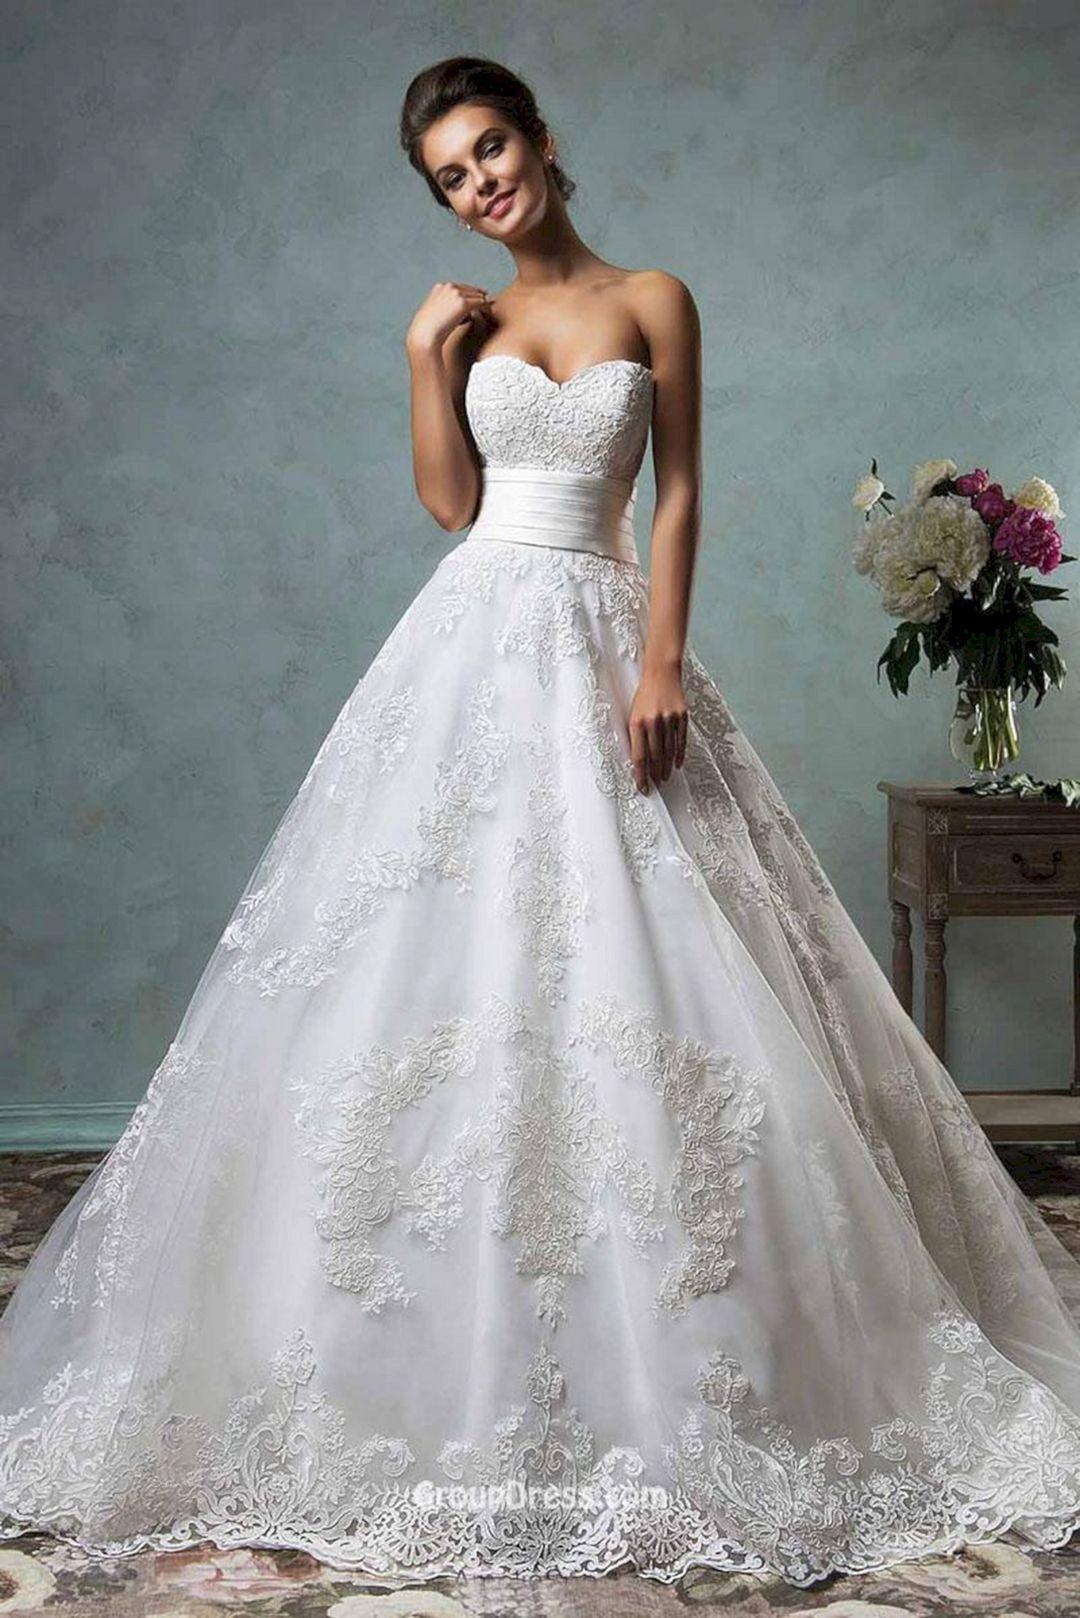 Sweetheart ball gown wedding dress   Most Amazing Ball Gown Wedding Dresses That Every People Will